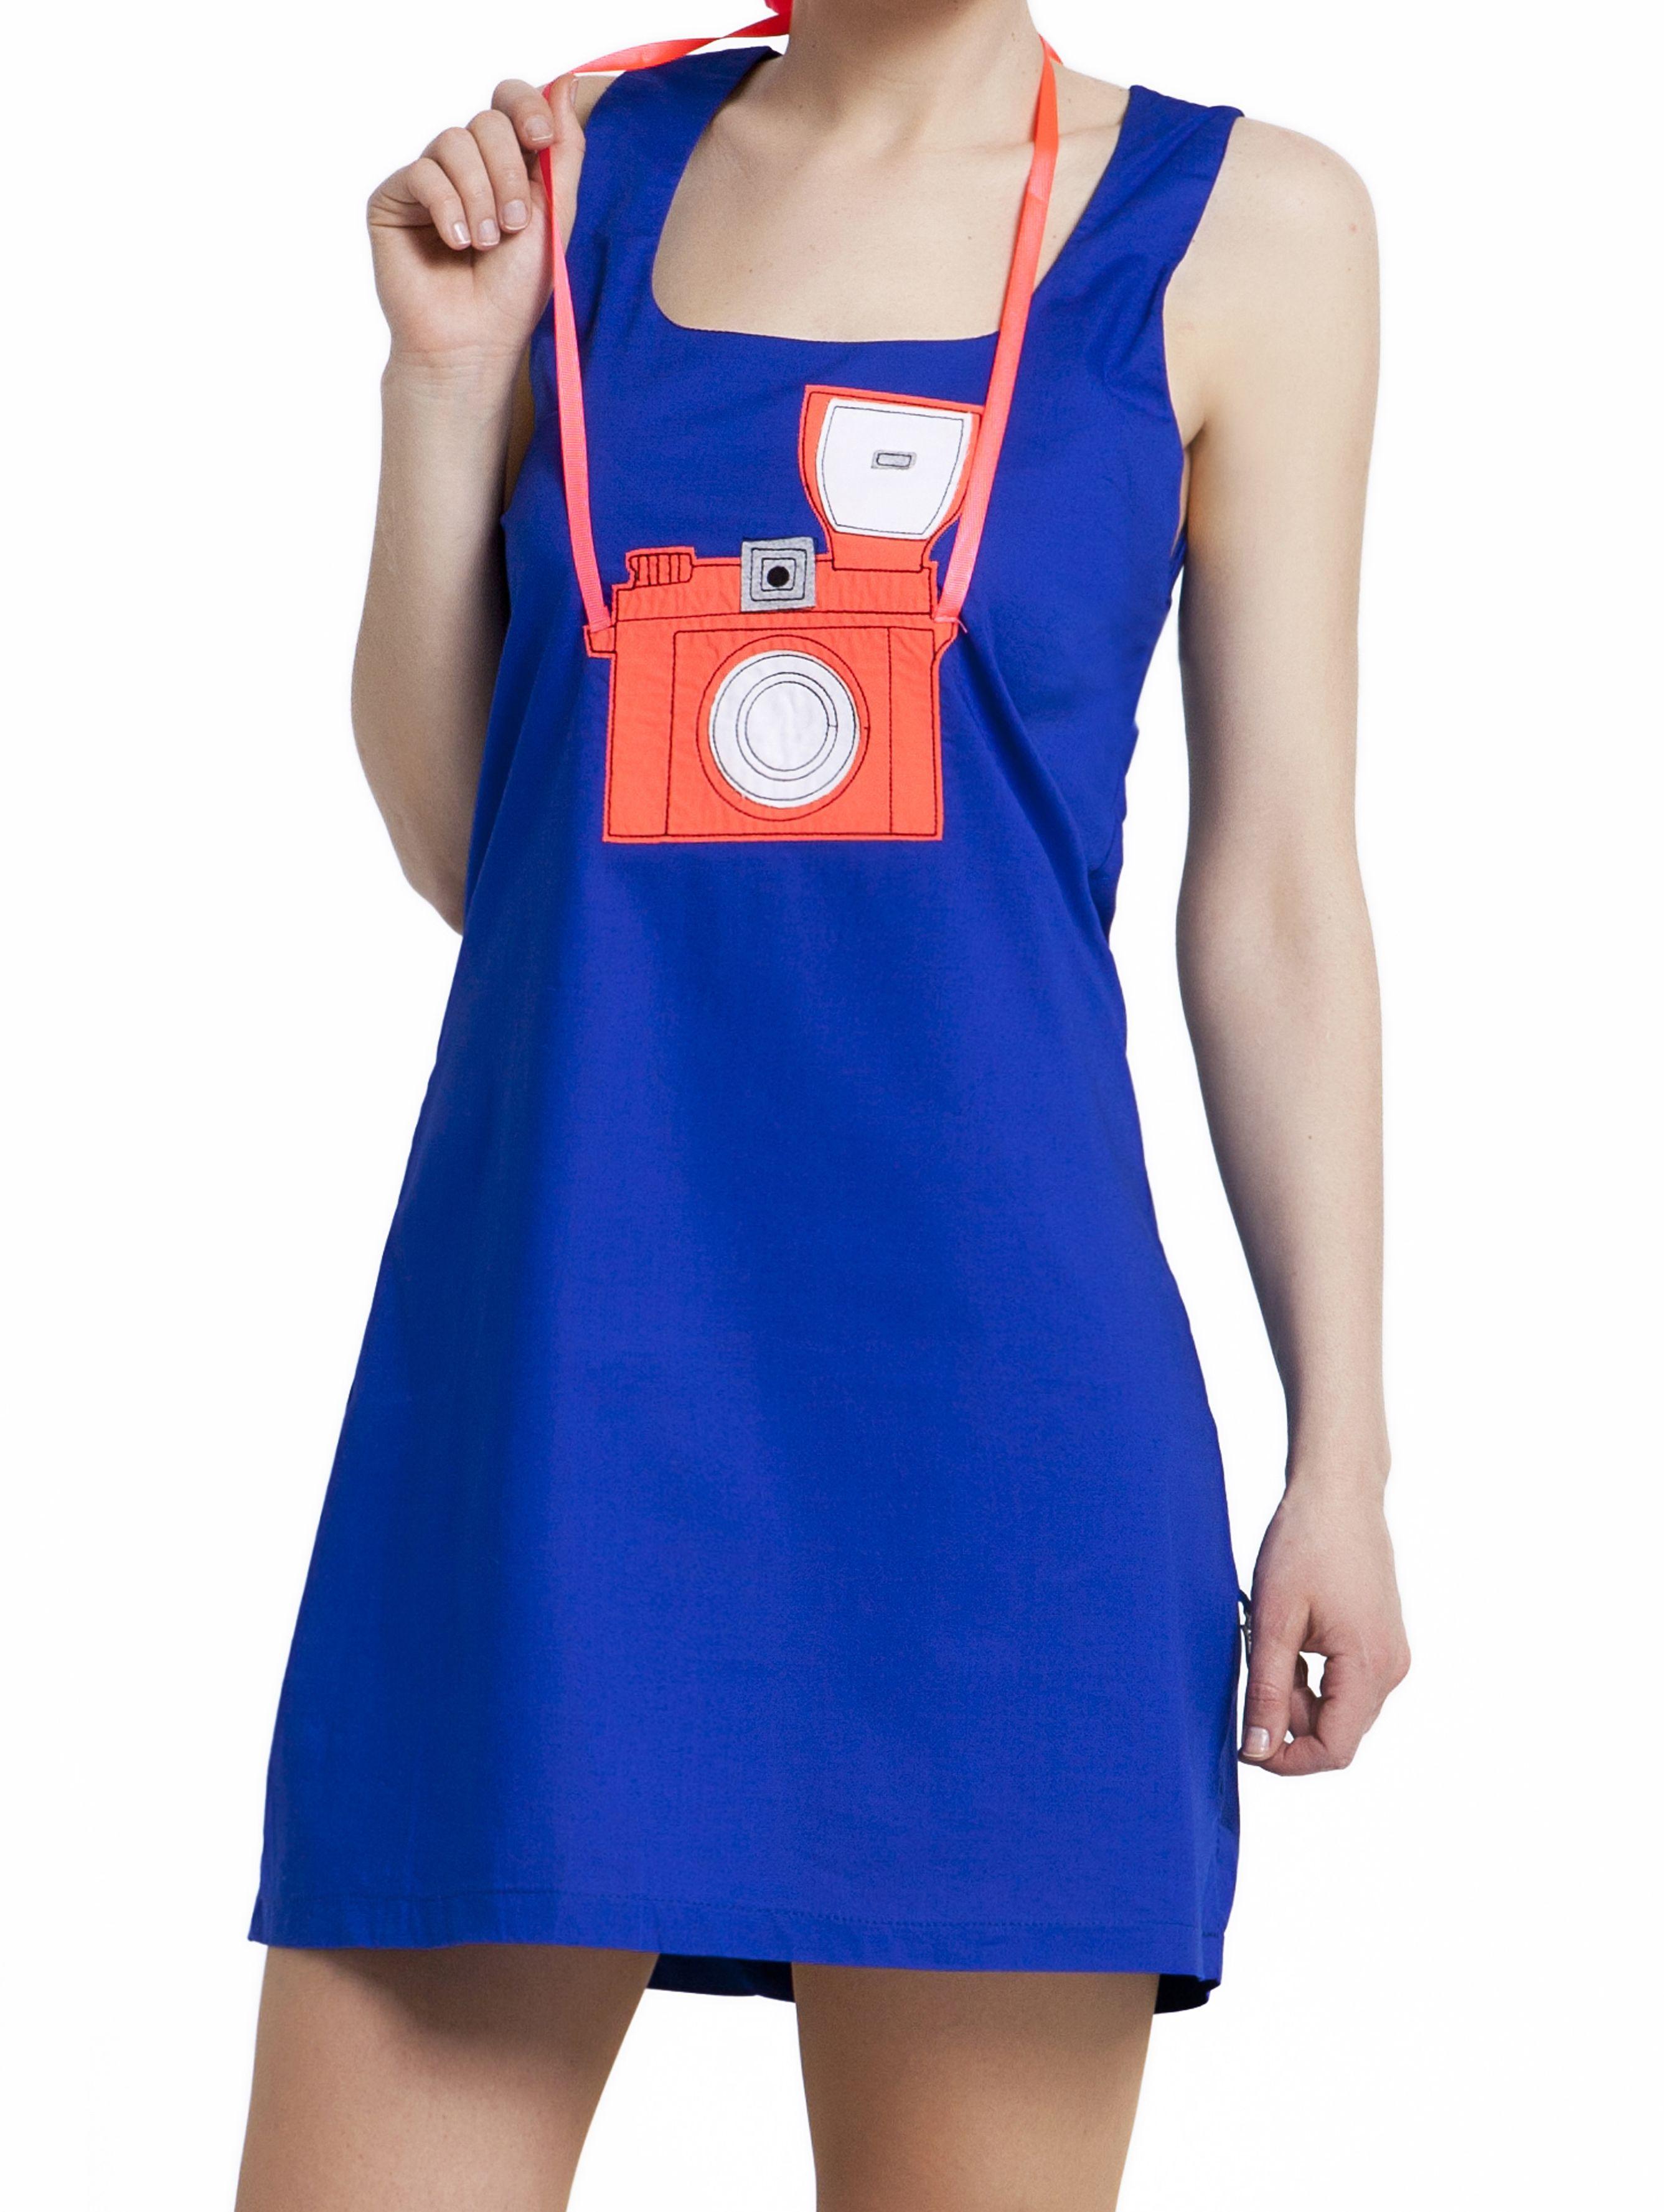 Say Cheese Camera Applique Blue Mini Dress Fotograf Makinesi